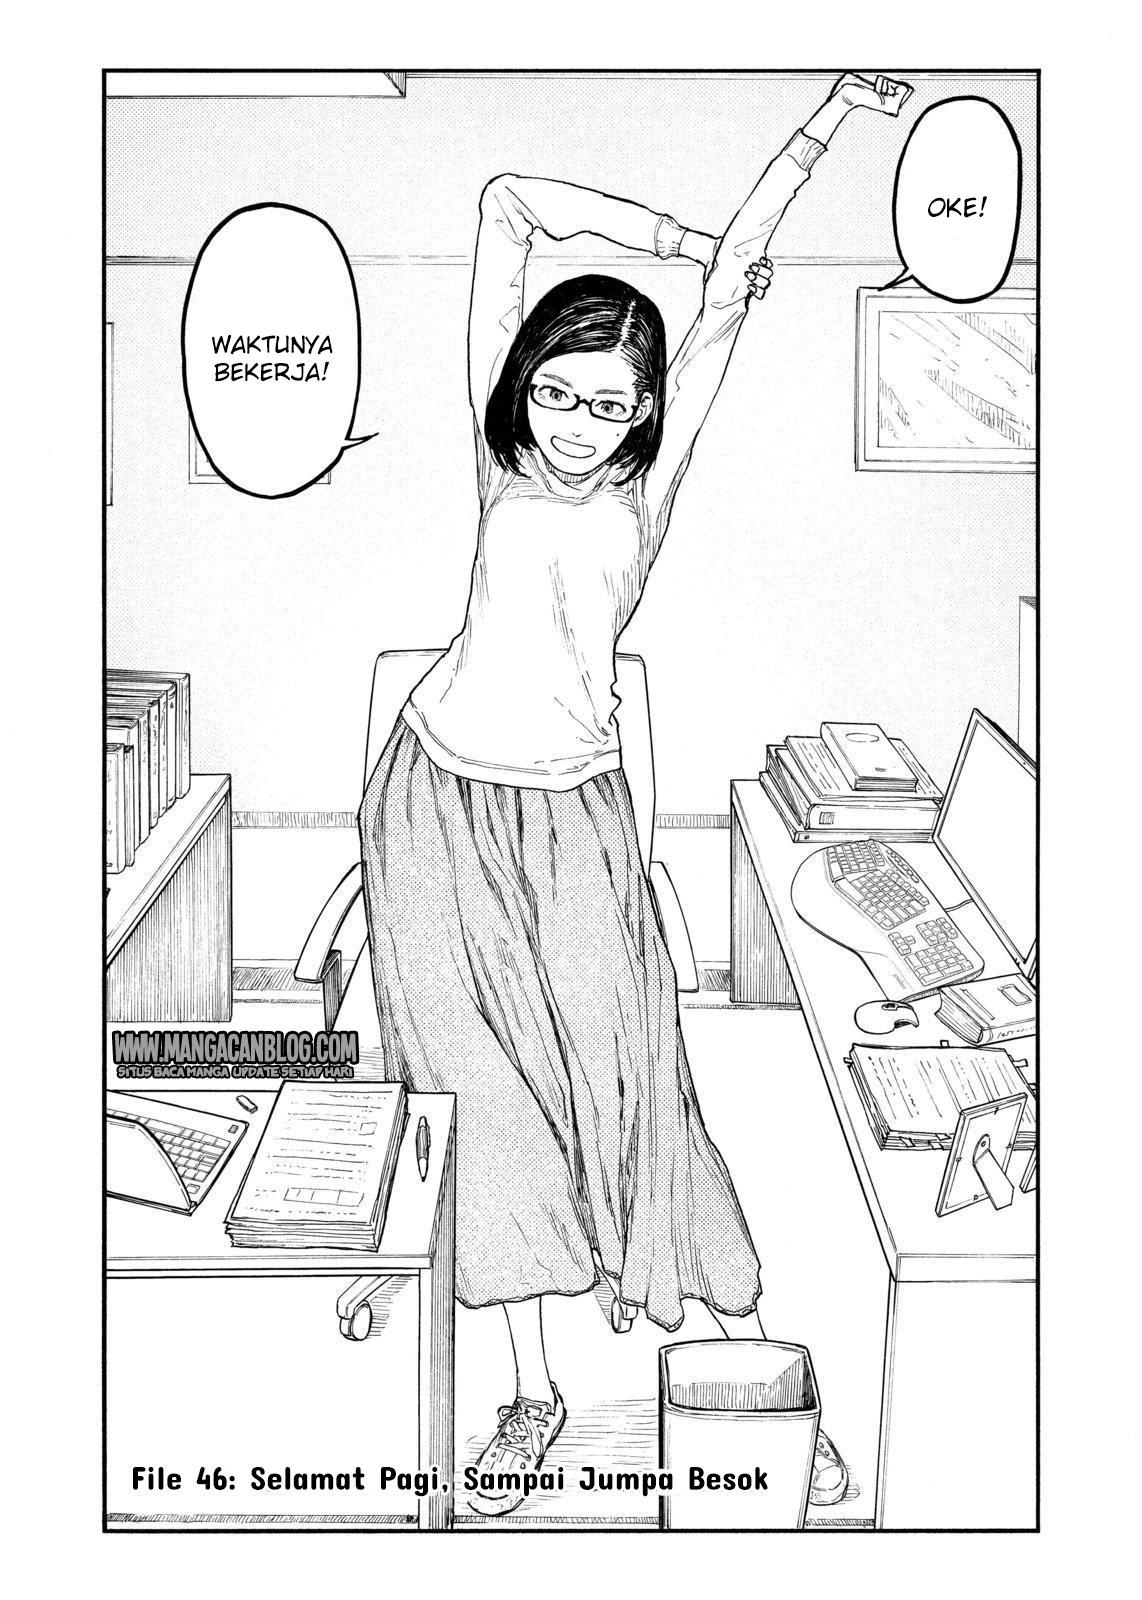 Dilarang COPAS - situs resmi www.mangacanblog.com - Komik ajin 046 - selamat pagi, sampai jumpa besok 47 Indonesia ajin 046 - selamat pagi, sampai jumpa besok Terbaru 4|Baca Manga Komik Indonesia|Mangacan